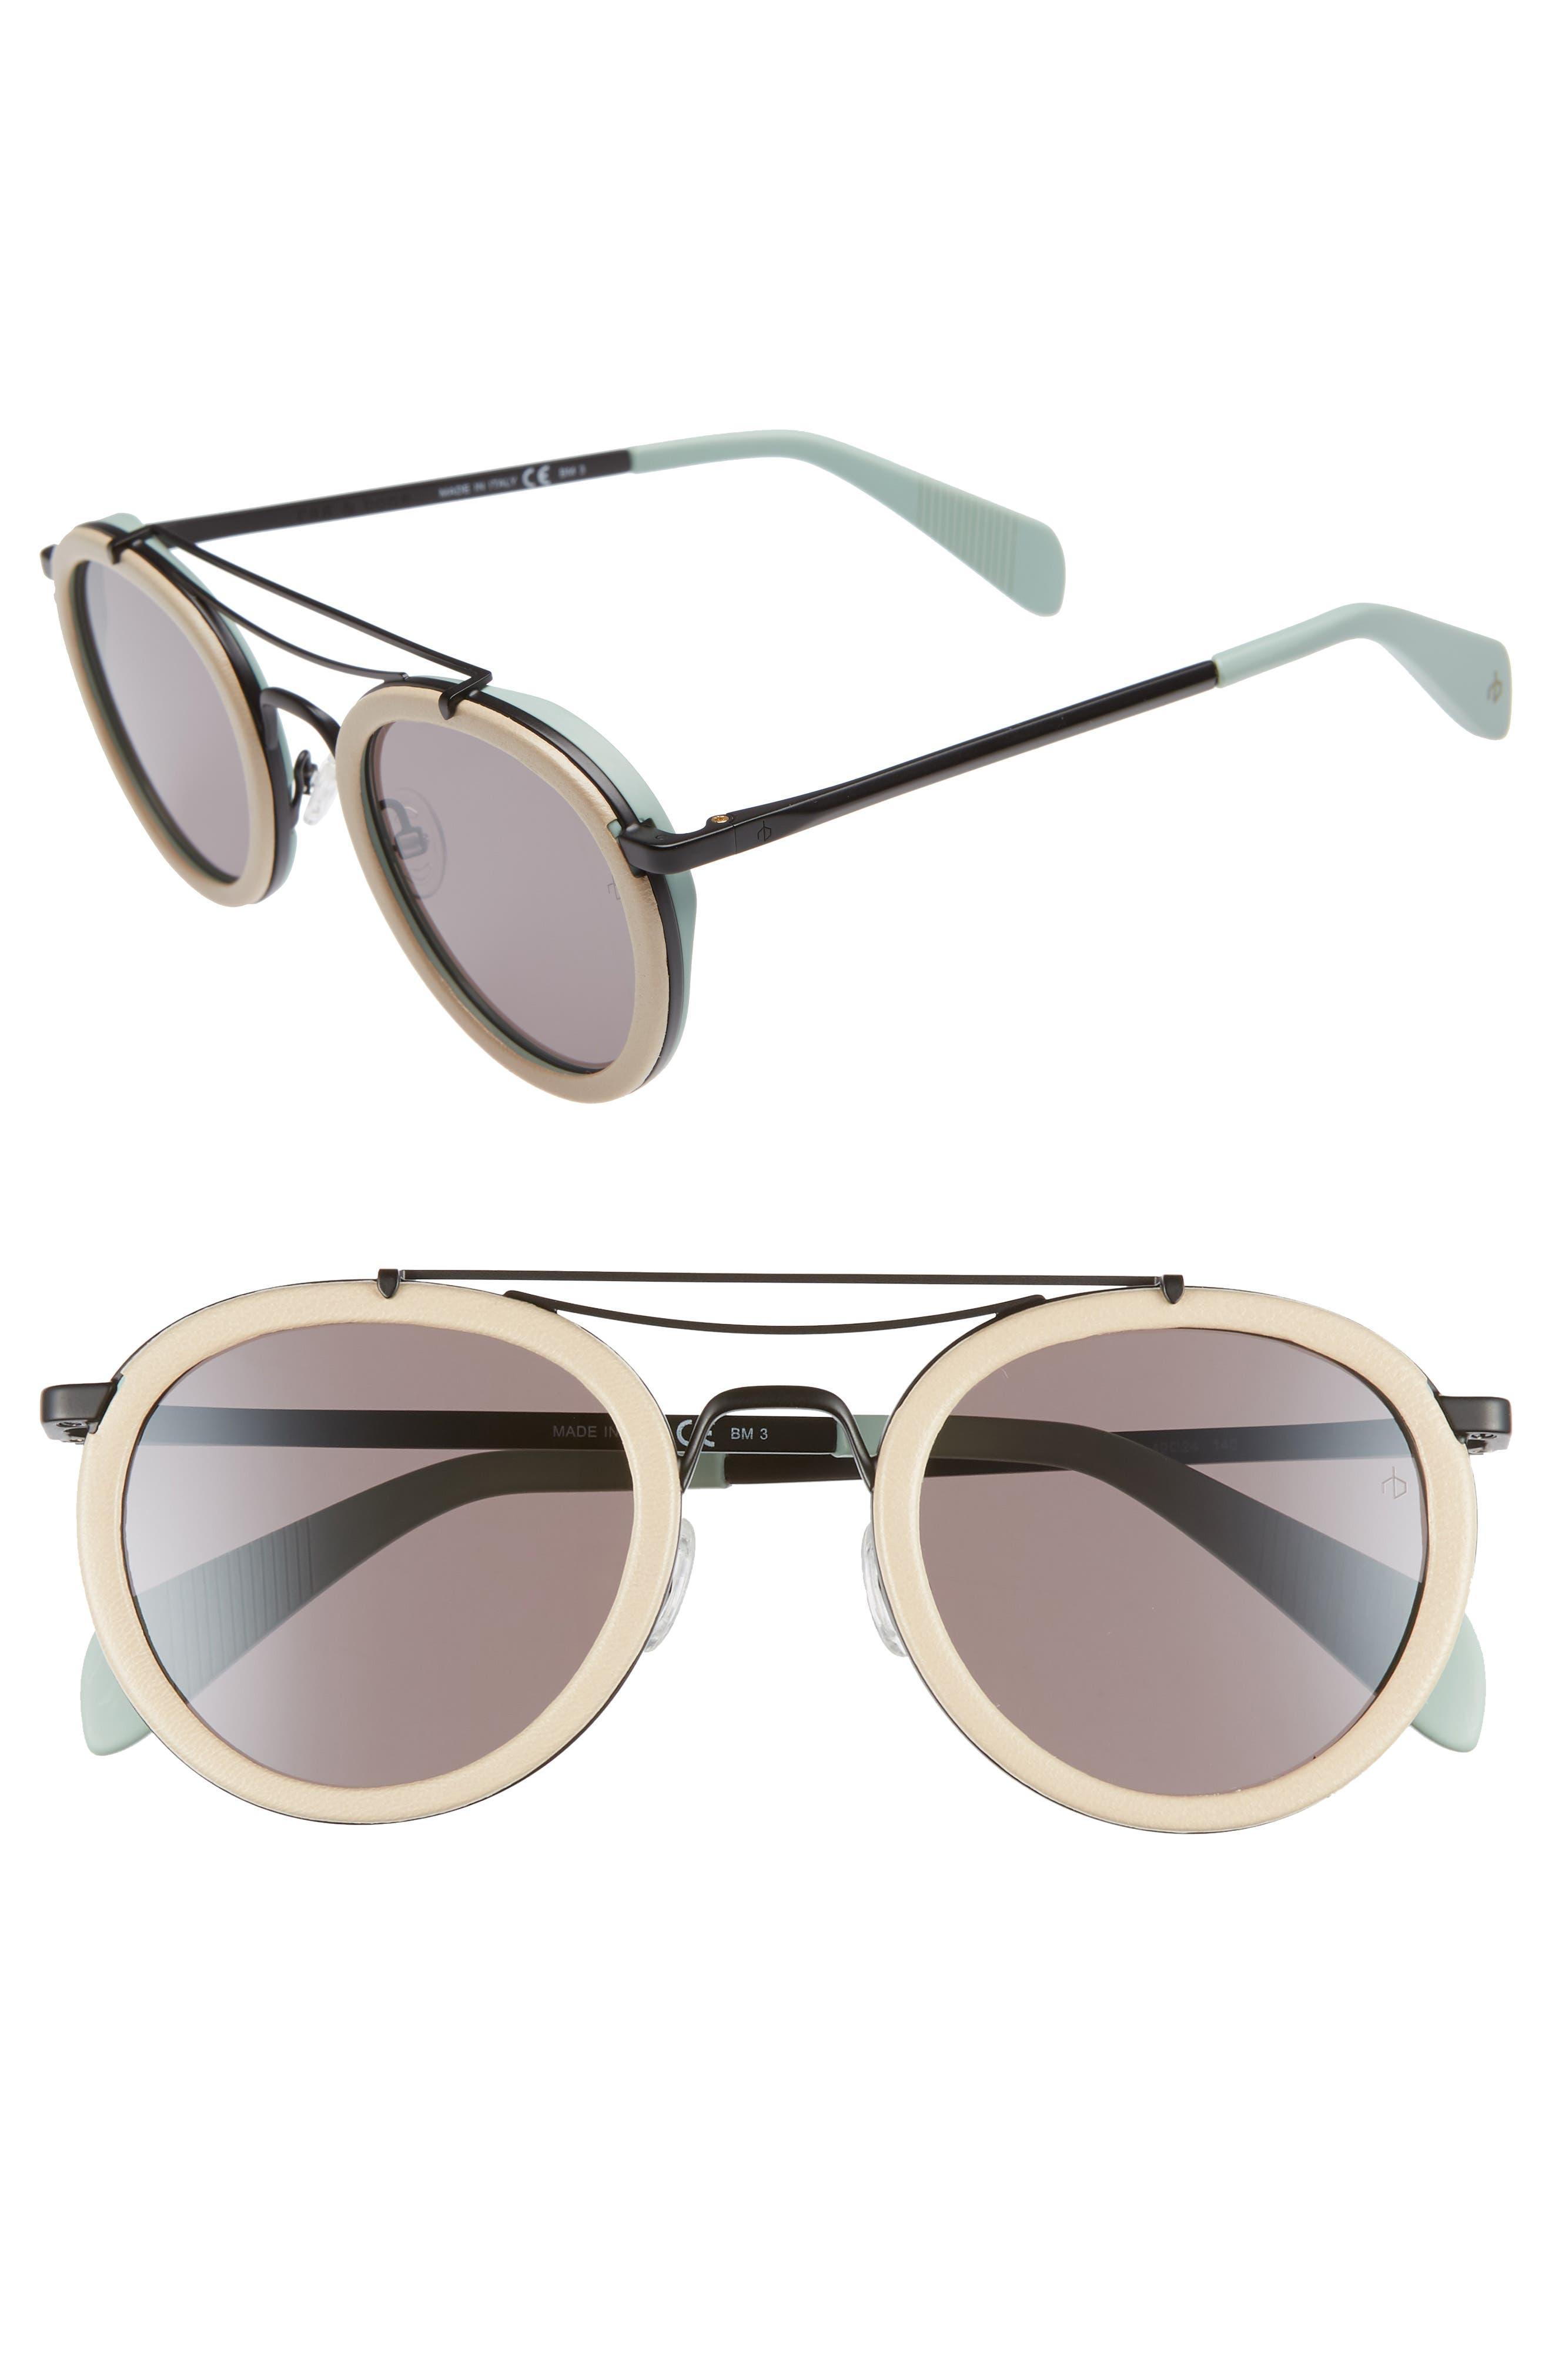 55mm Round Aviator Sunglasses,                         Main,                         color, MATTE BLACK BEIGE